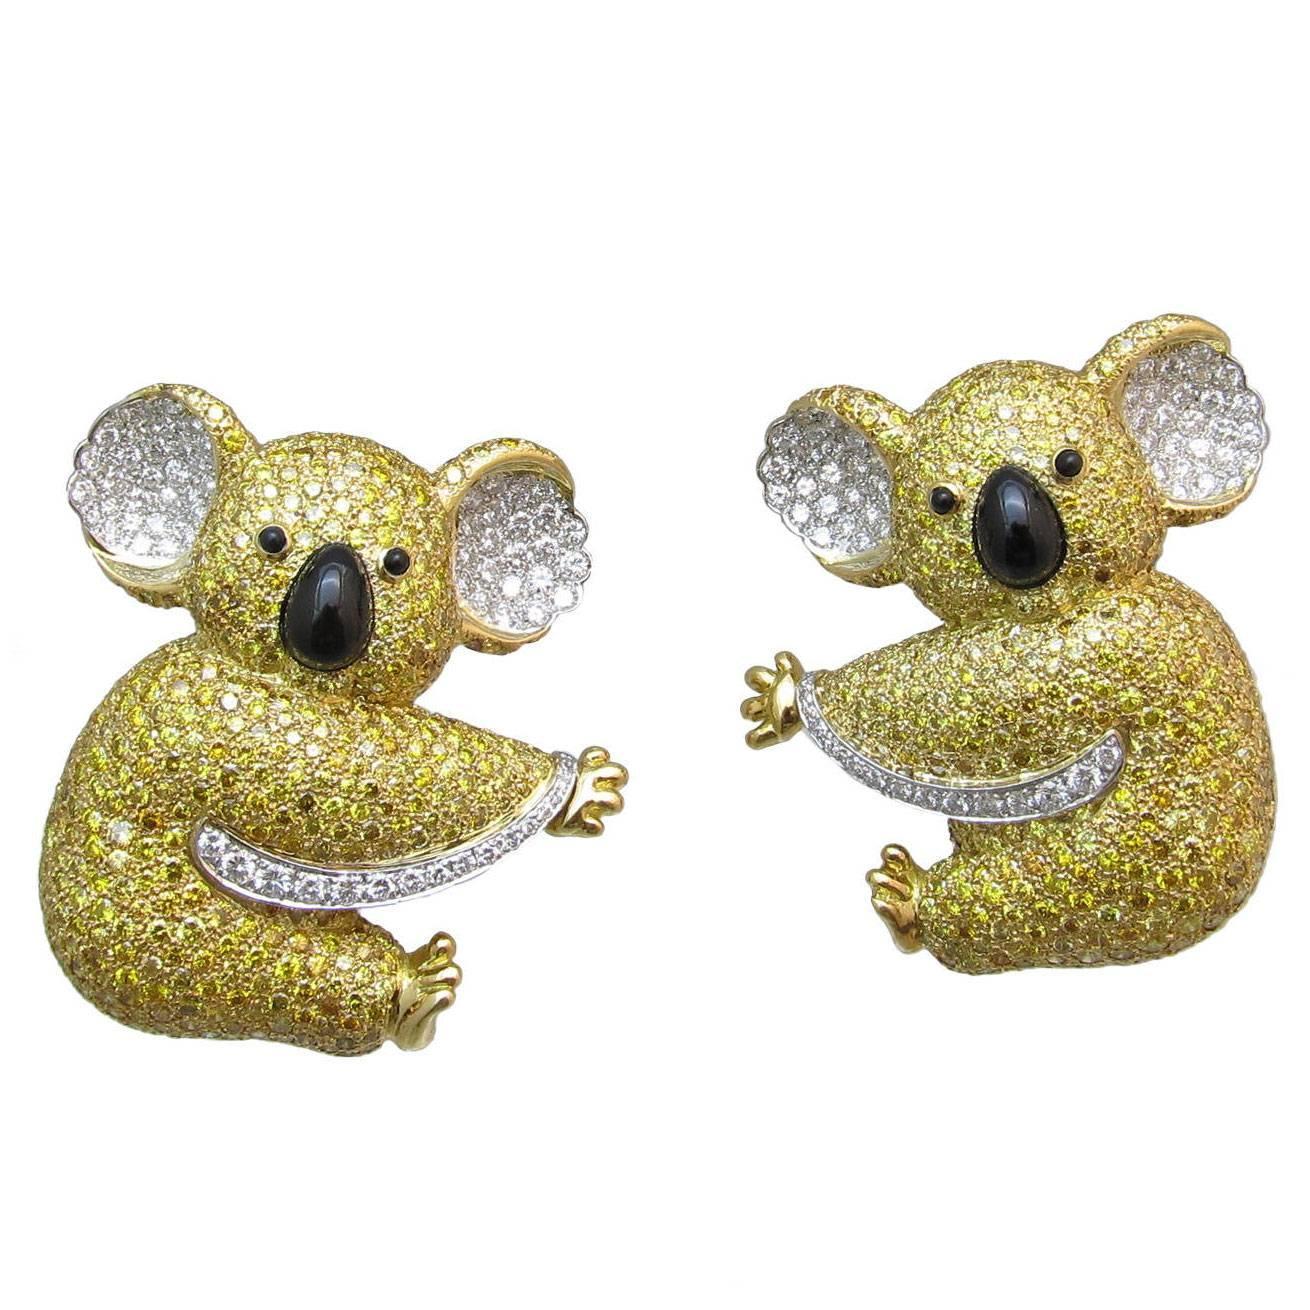 graff yellow two koala detachable brooch for